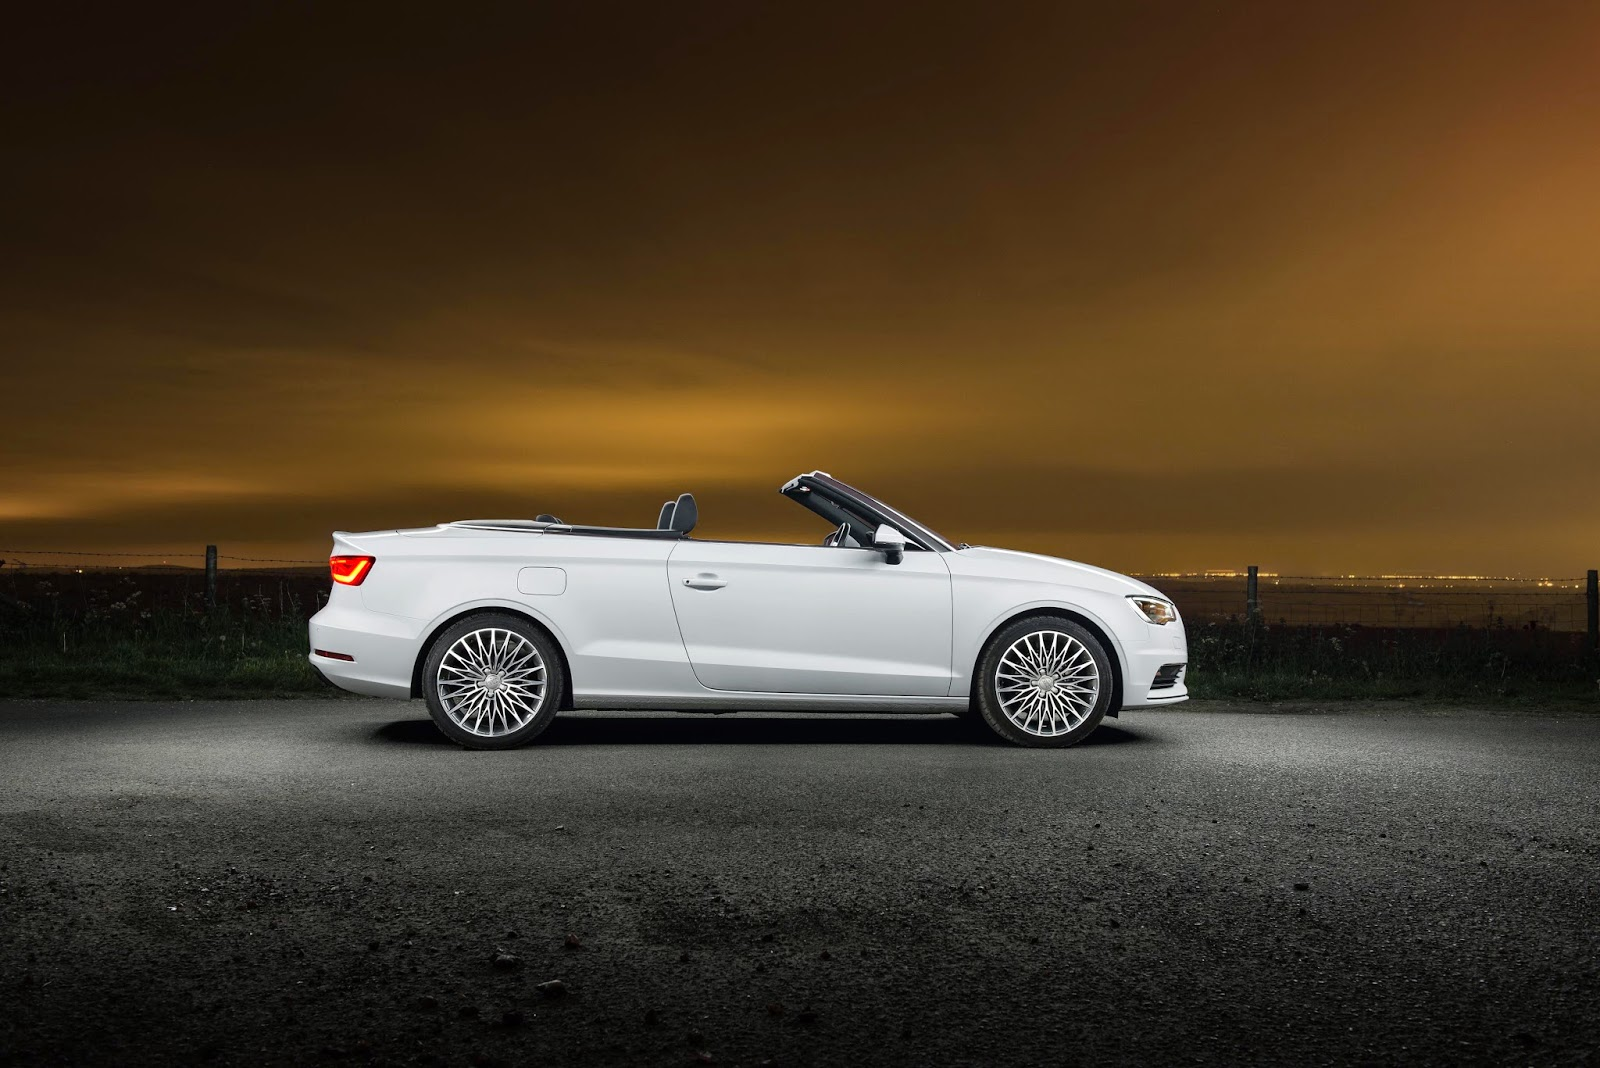 White Audi A3 Convertible